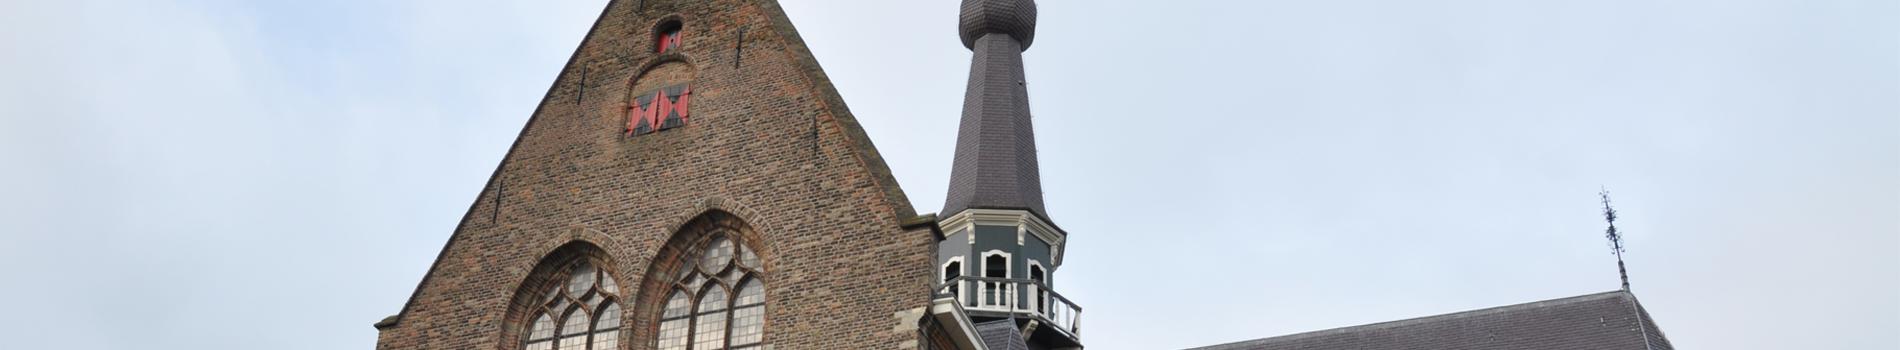 Kerkaandehaven1900x350